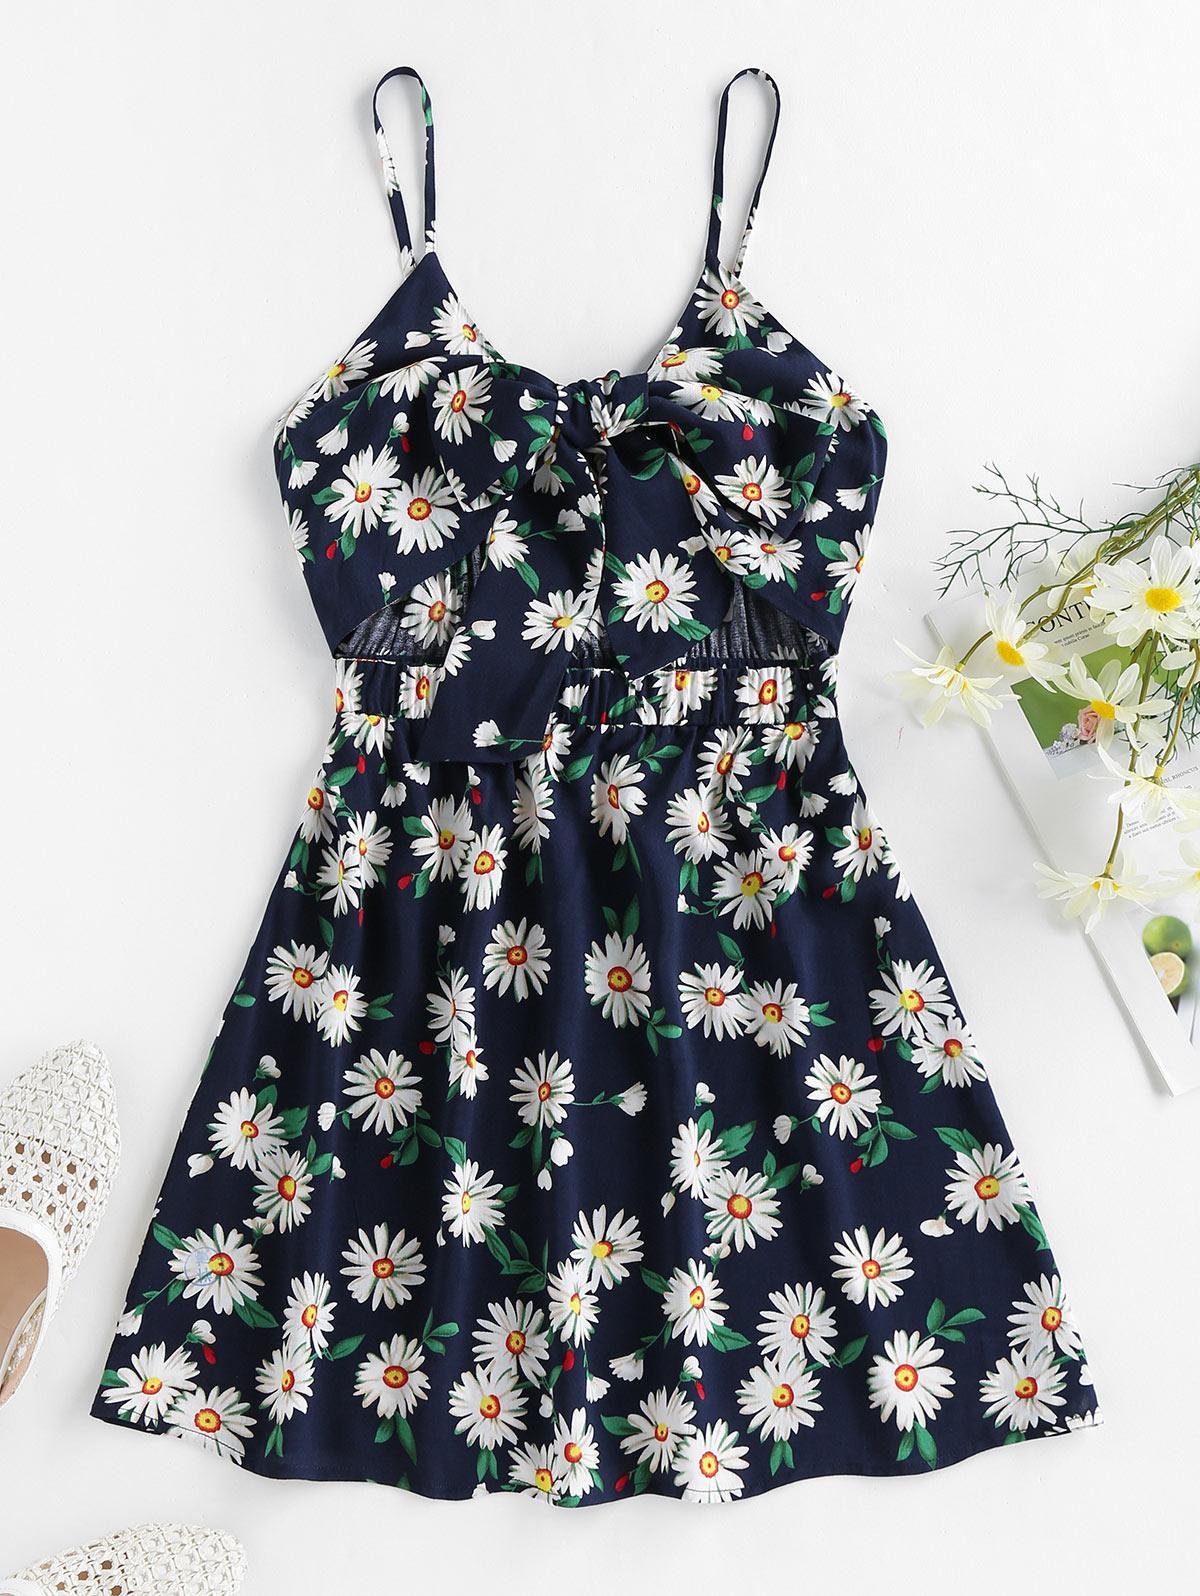 ZAFUL Daisy Print Bowknot Cutout Mini Dress